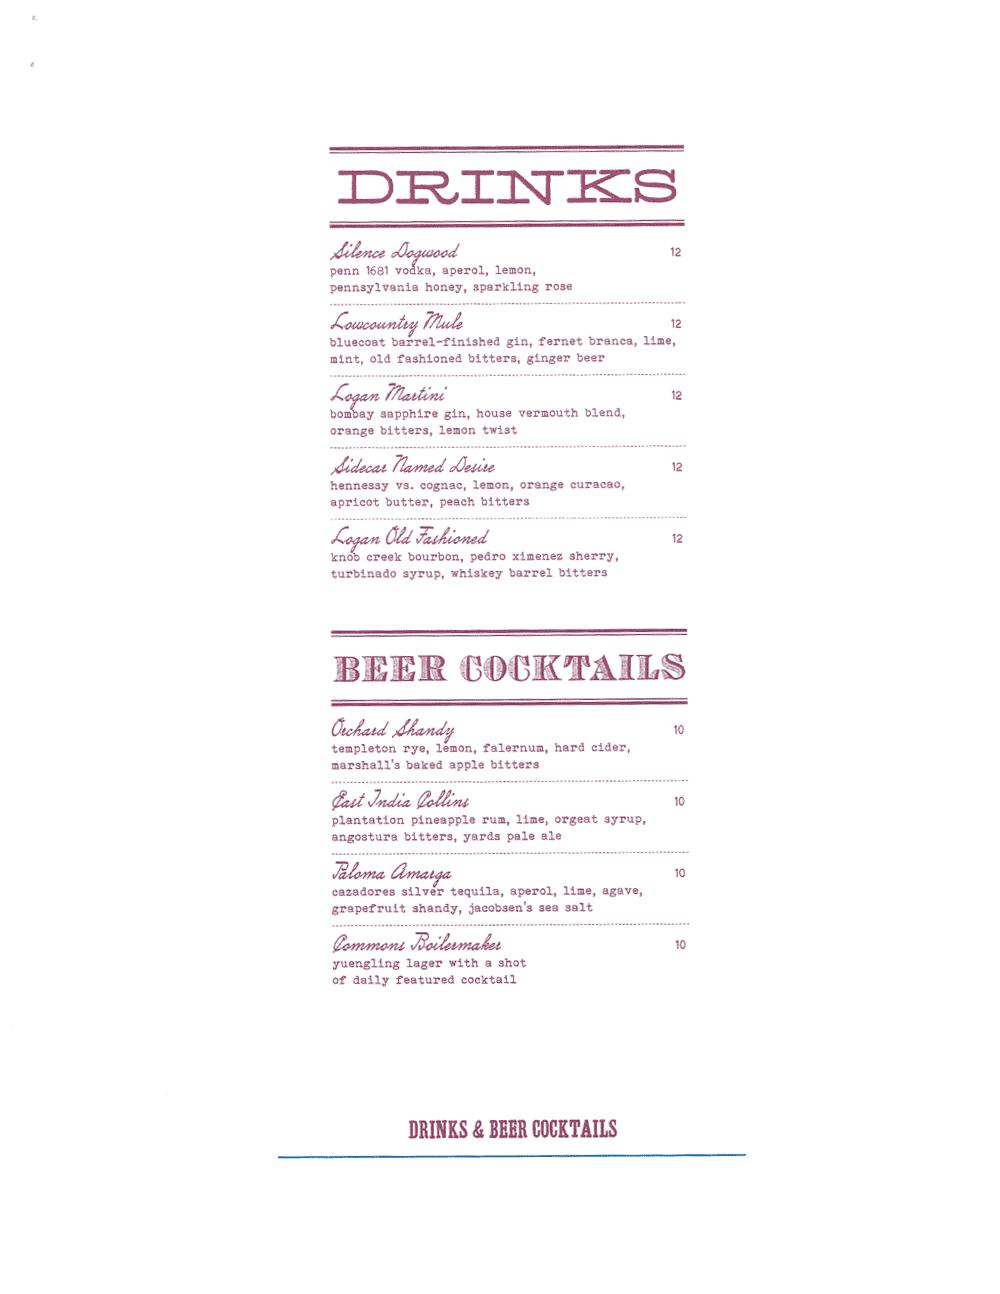 commons-drinks-beer-cocktails-menu